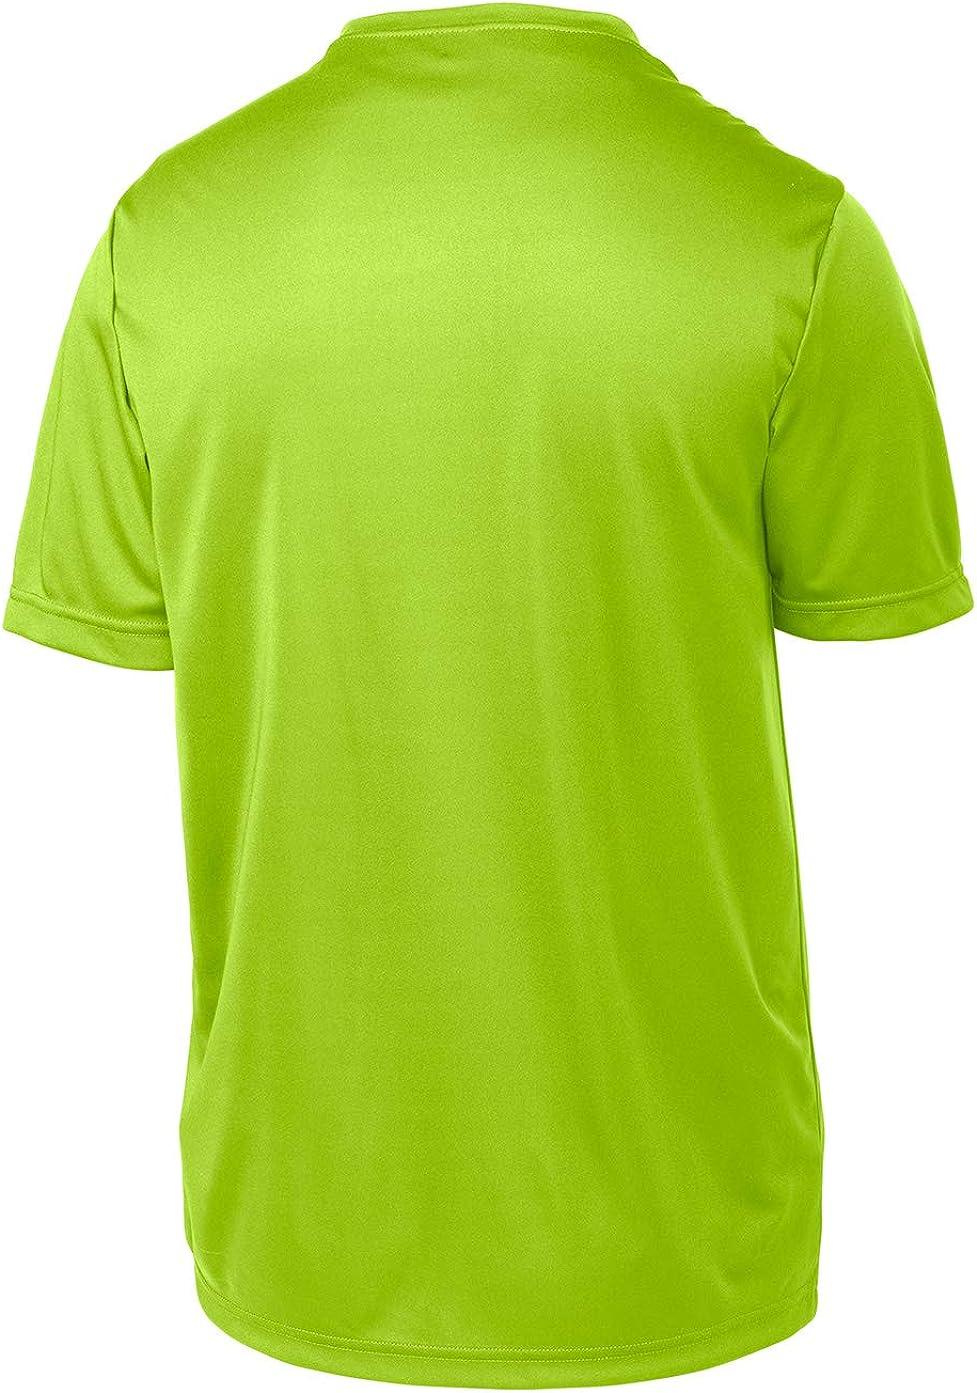 Youth /& Teen Sizes Opna Youth Boys Dri Fit Athletic T Shirts for Boys /& Girls Sports Undershirt